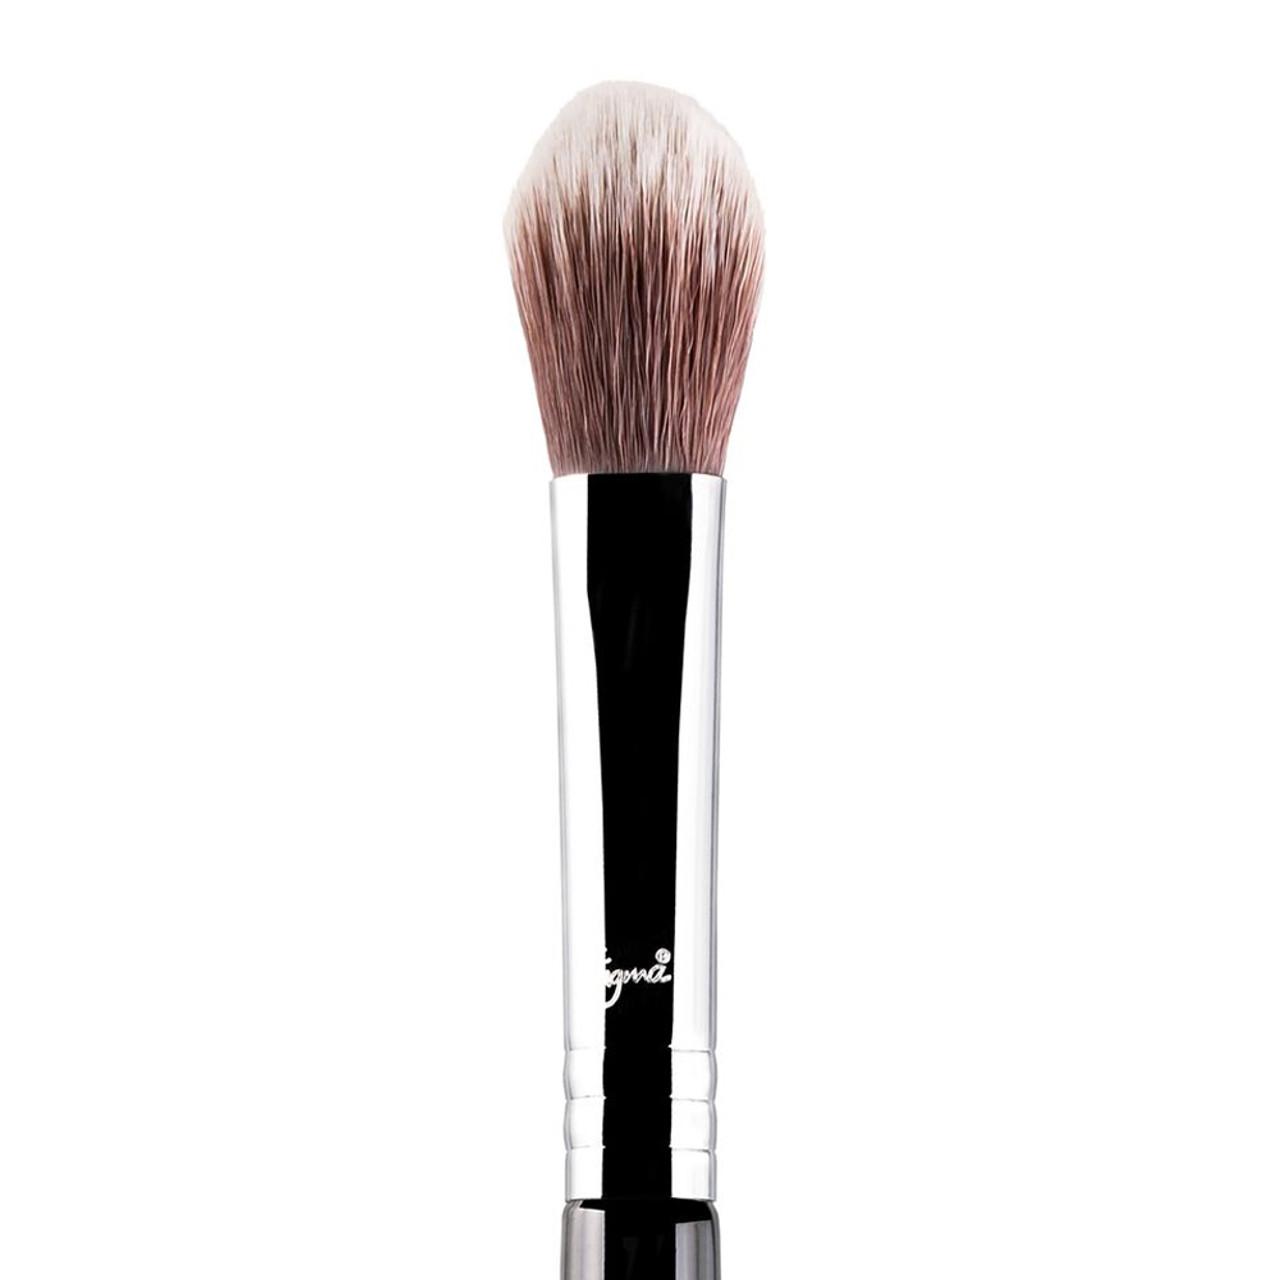 Sigma Beauty F03 - High Cheekbone Highlighter